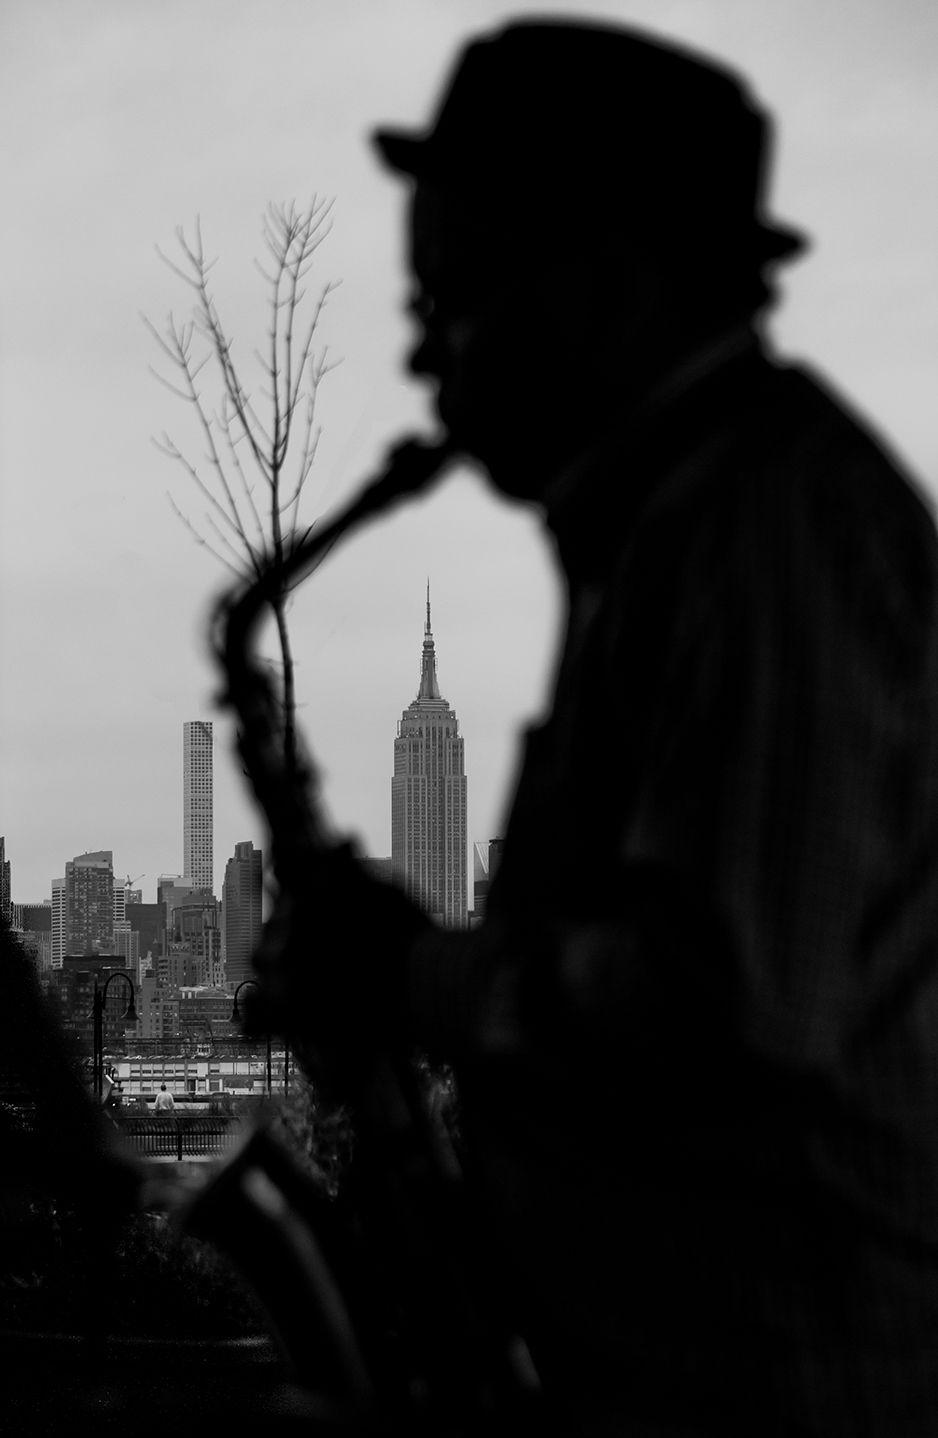 photo by Lori Sloan  https://infocus2017.wordpress.com/2017/04/21/jazz-by-the-river/